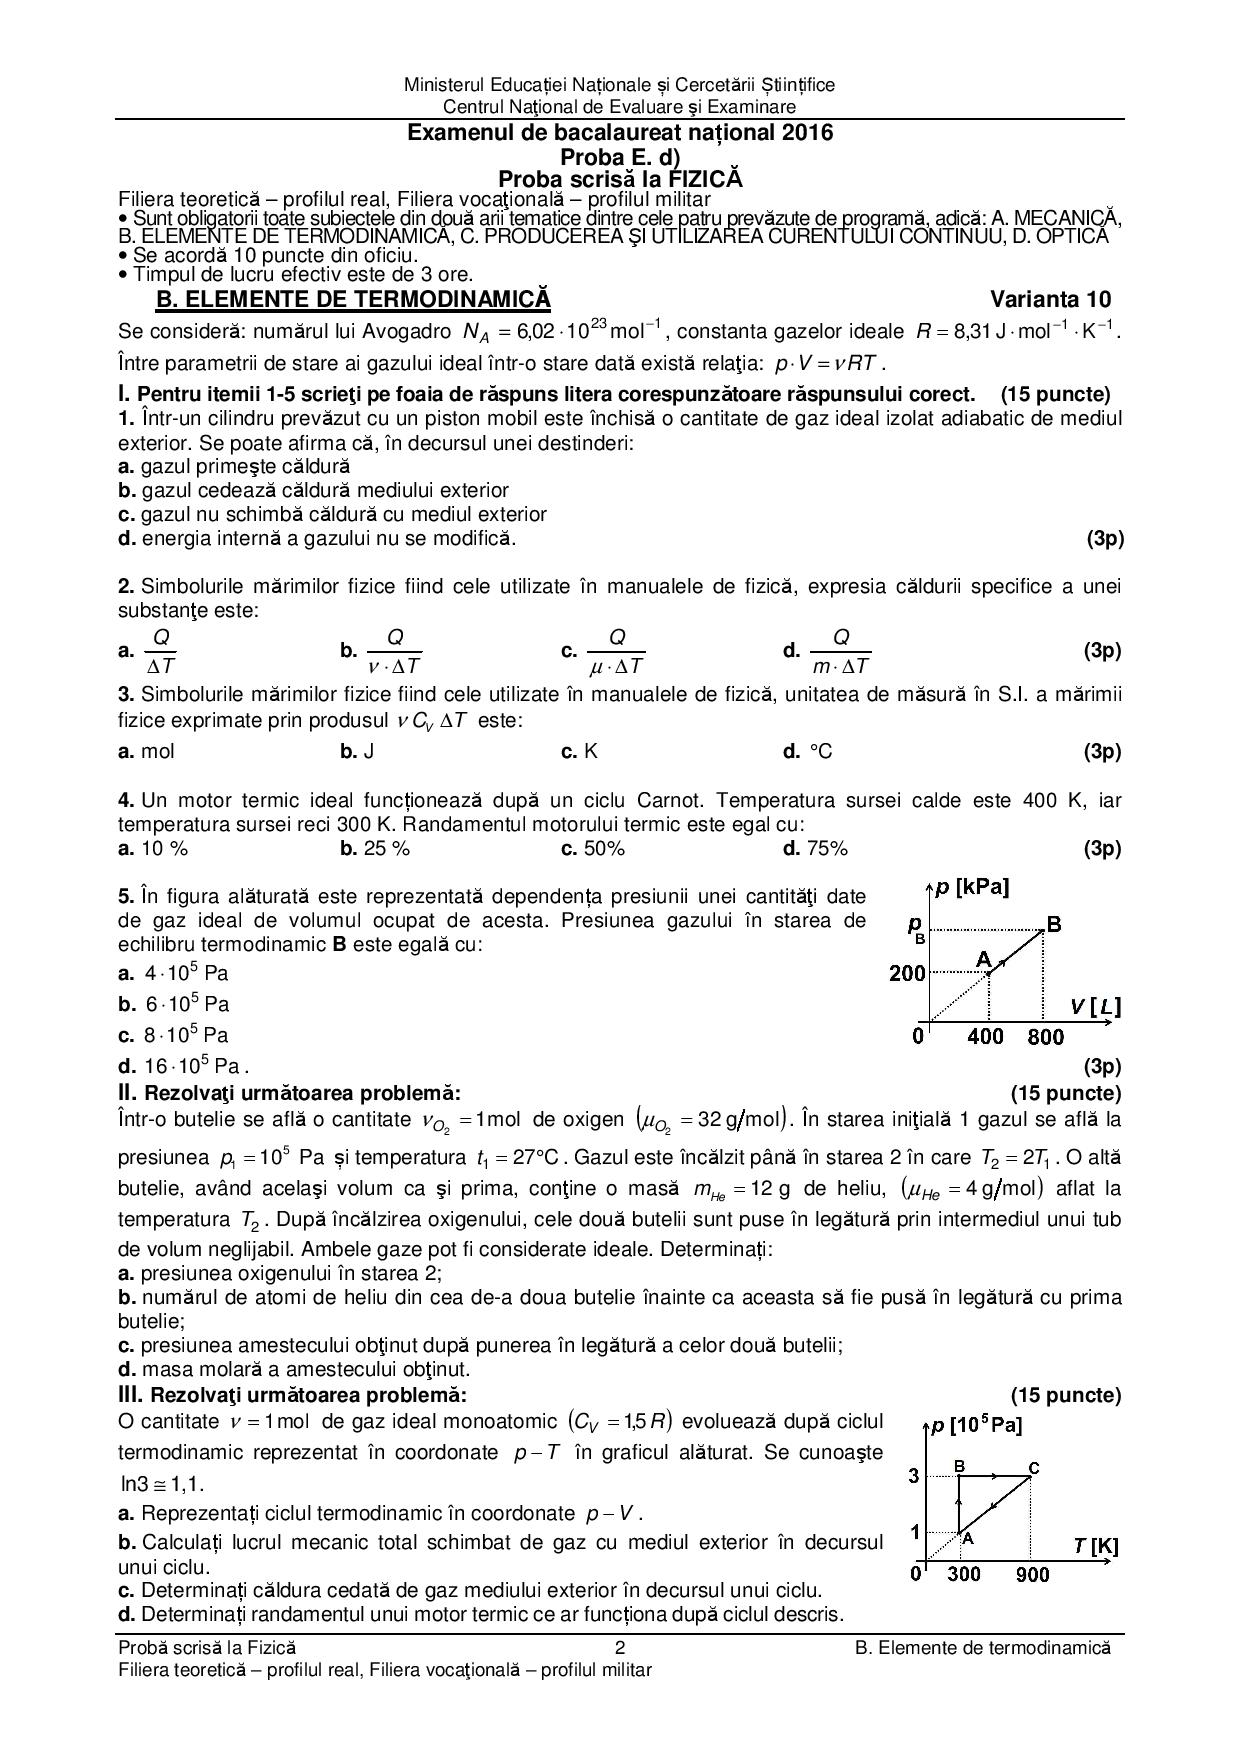 E_d_fizica_teoretic_vocational_2016_var_10_LRO-page-002